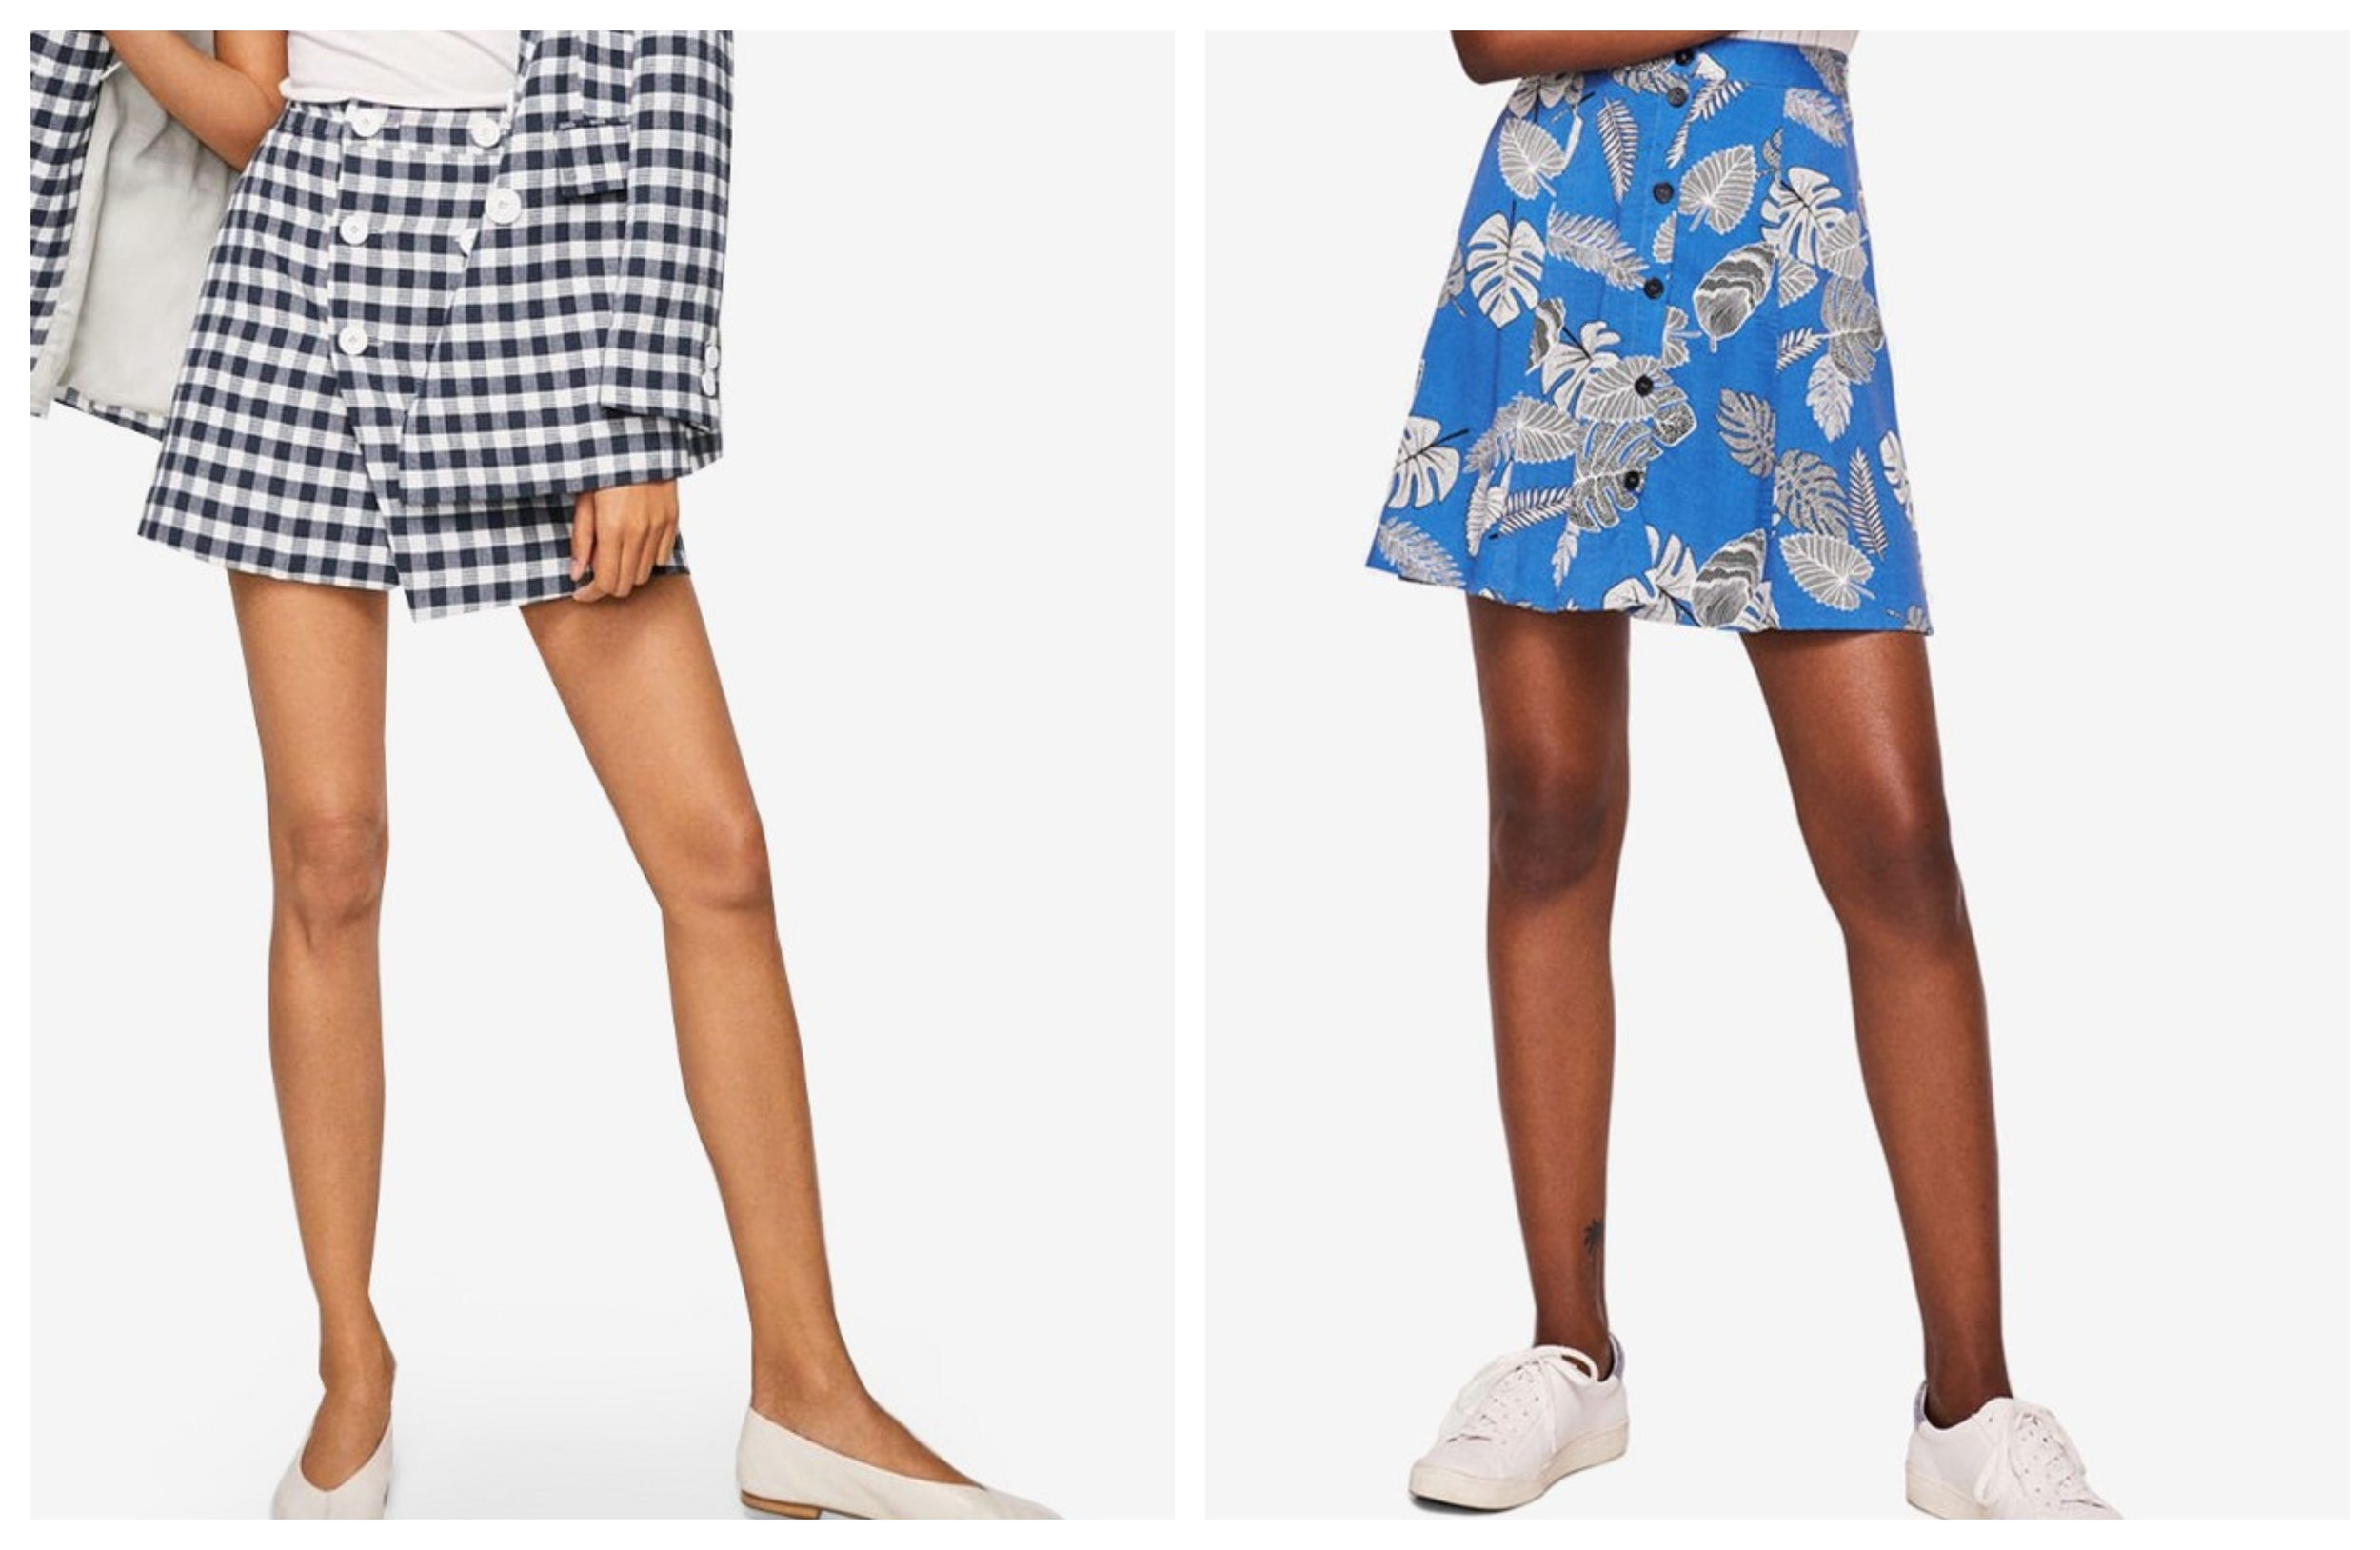 Mango Checked Print Skirt  | Mango Flowy Printed Skirt